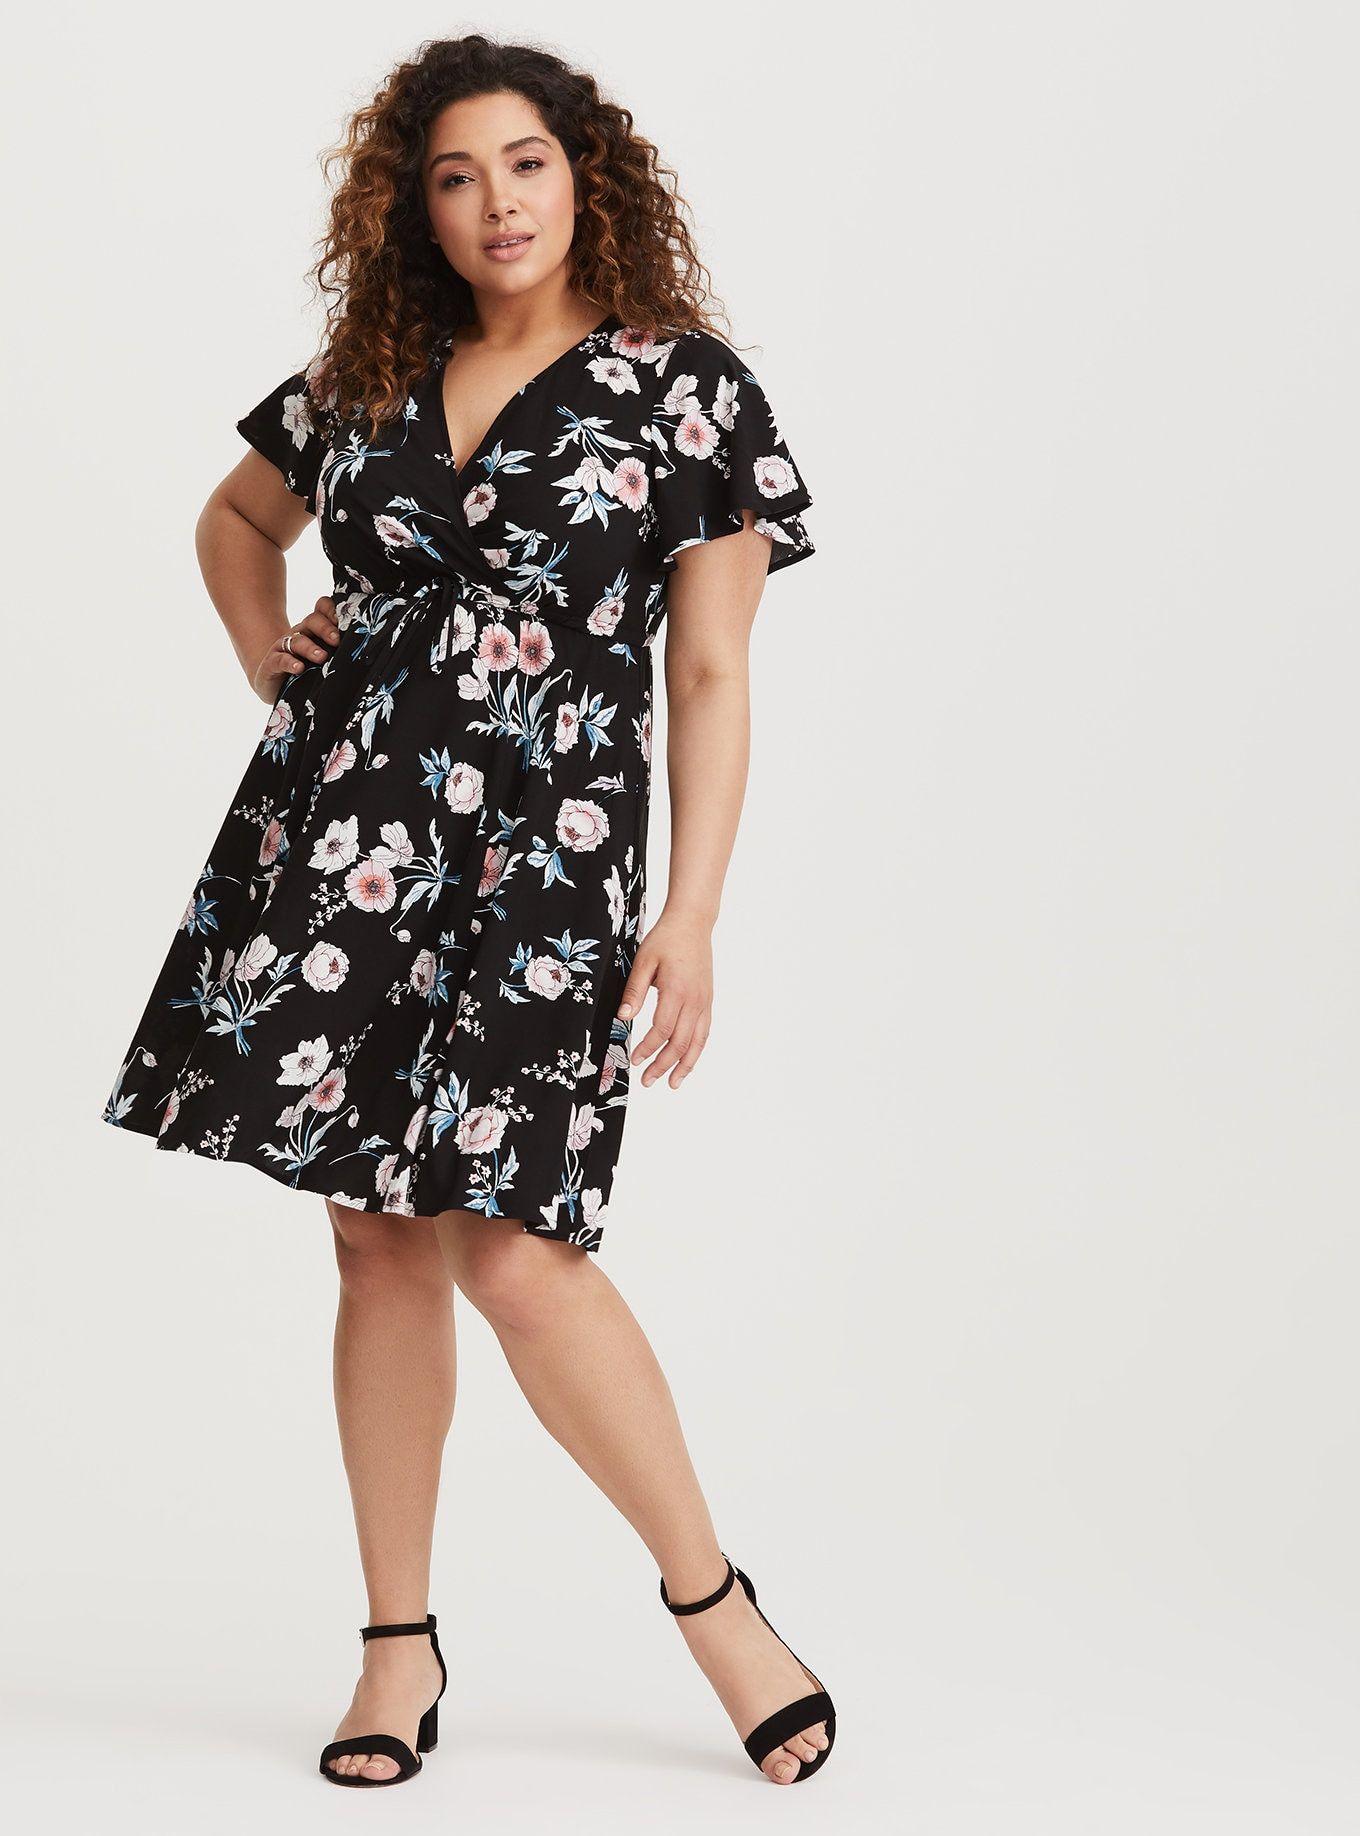 Black floral challis skater dress fit and flare cocktail